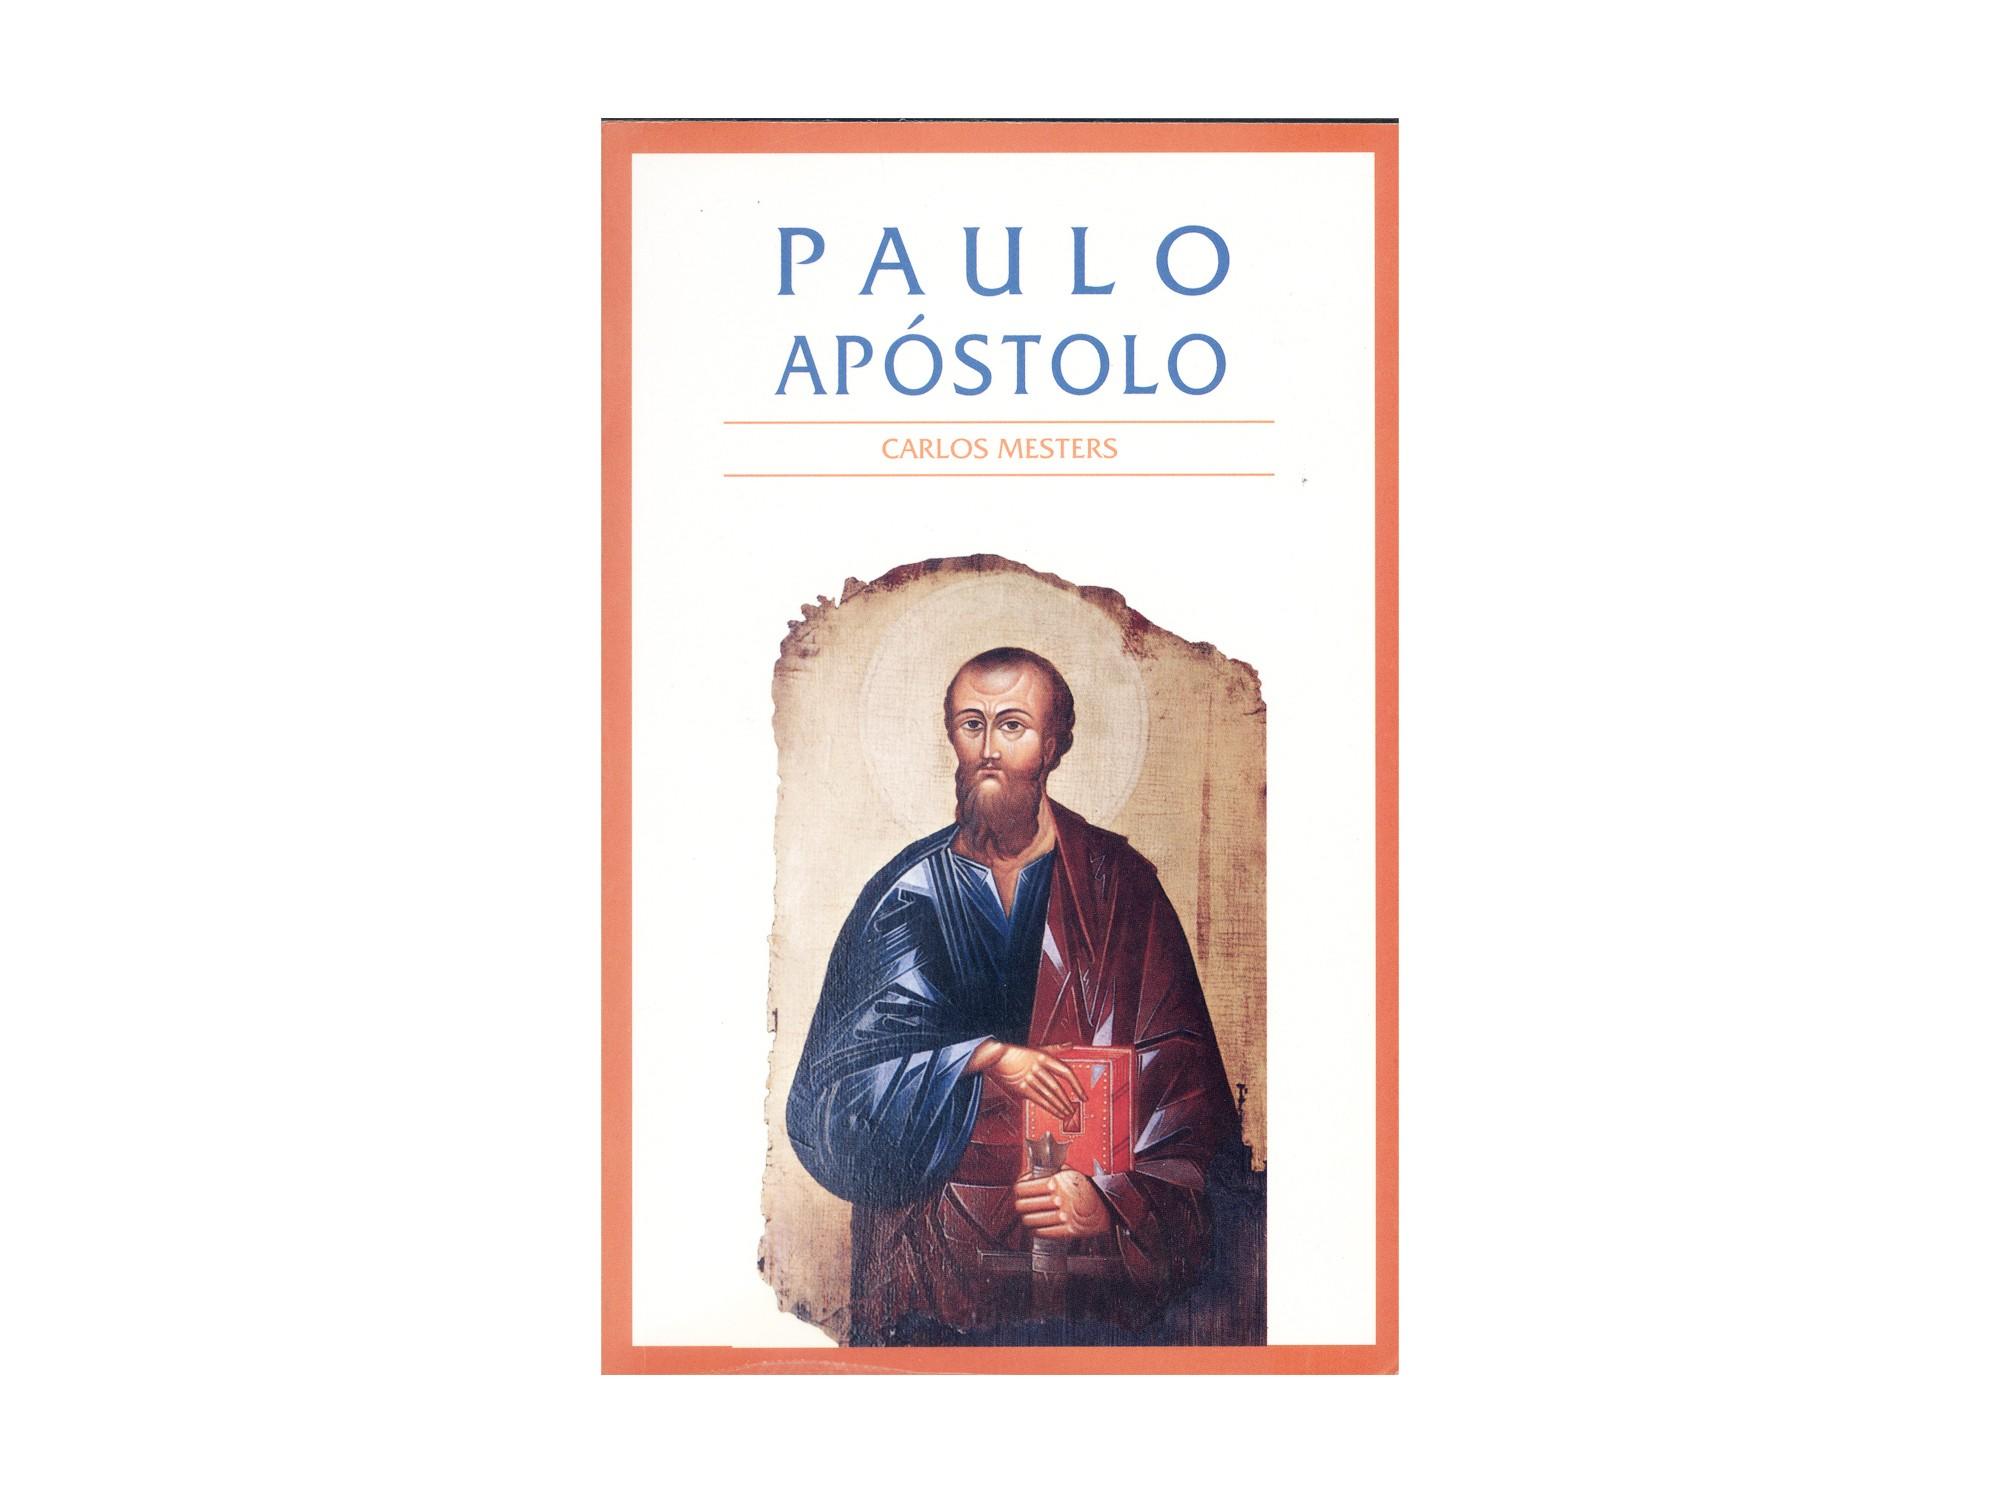 Paulo Apóstolo